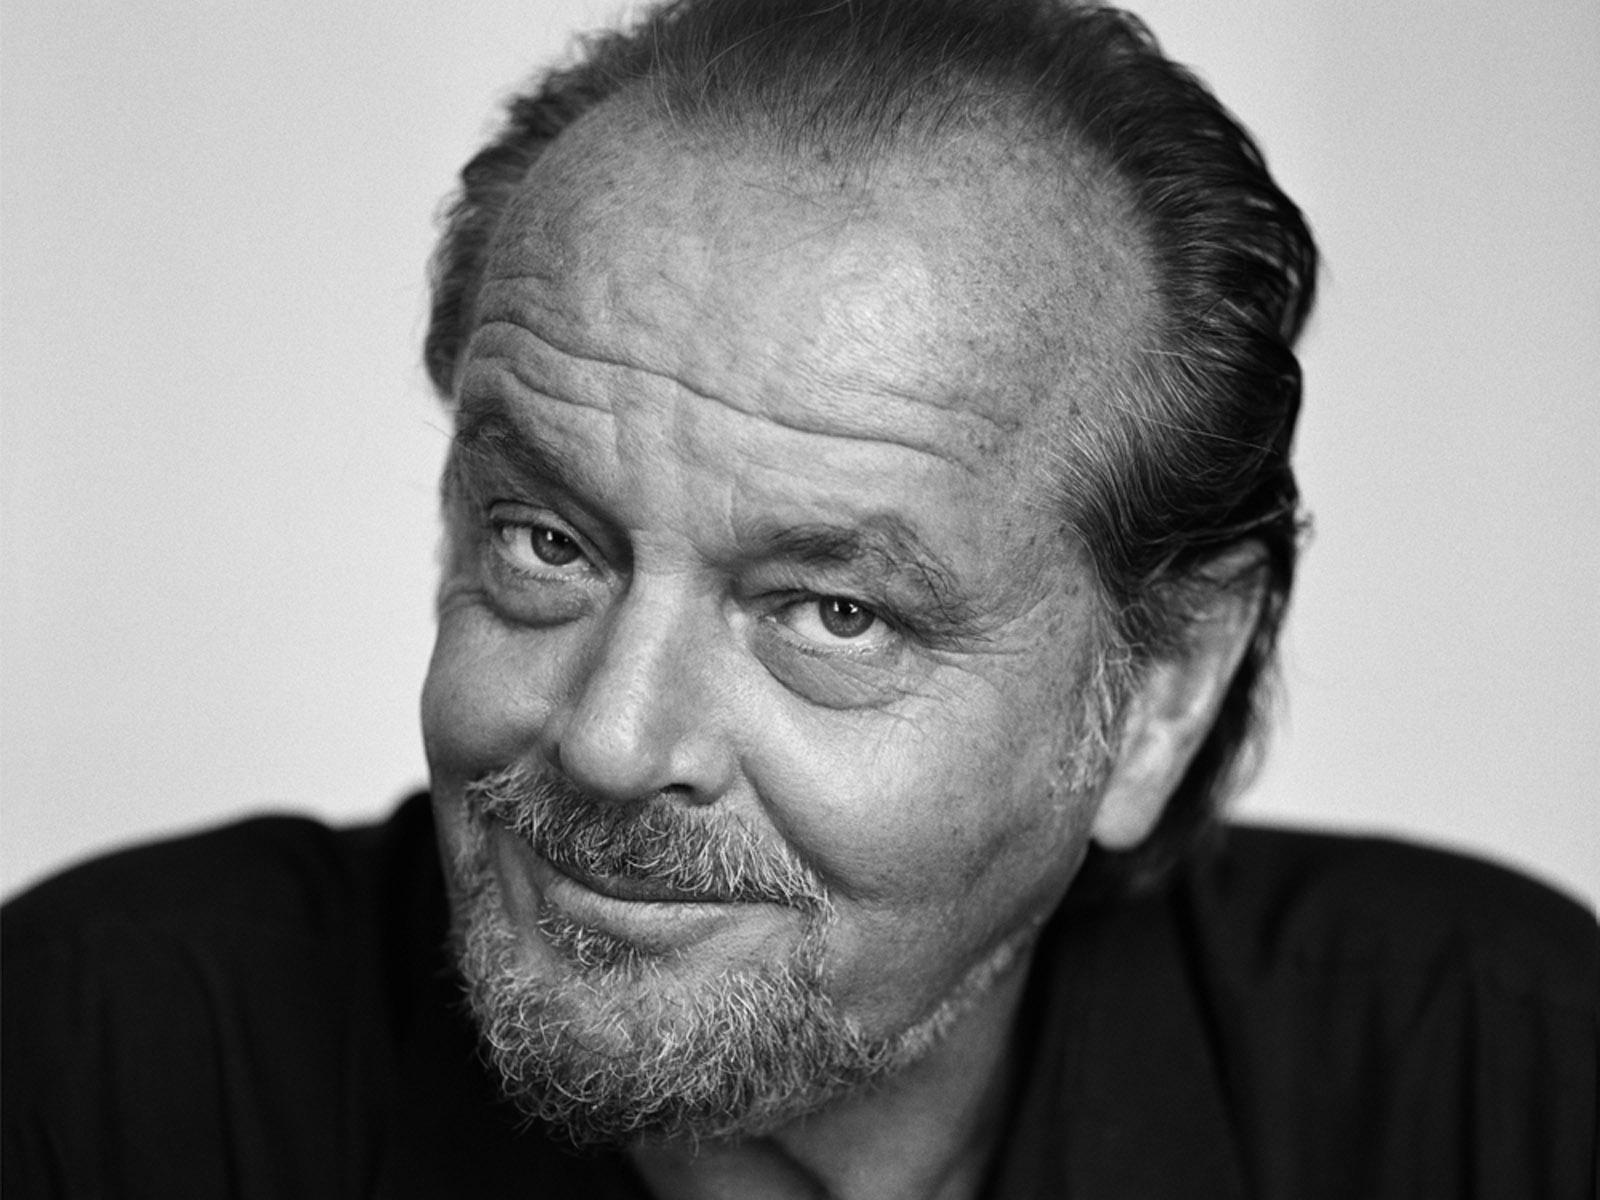 Images of Jack Nicholson   1600x1200